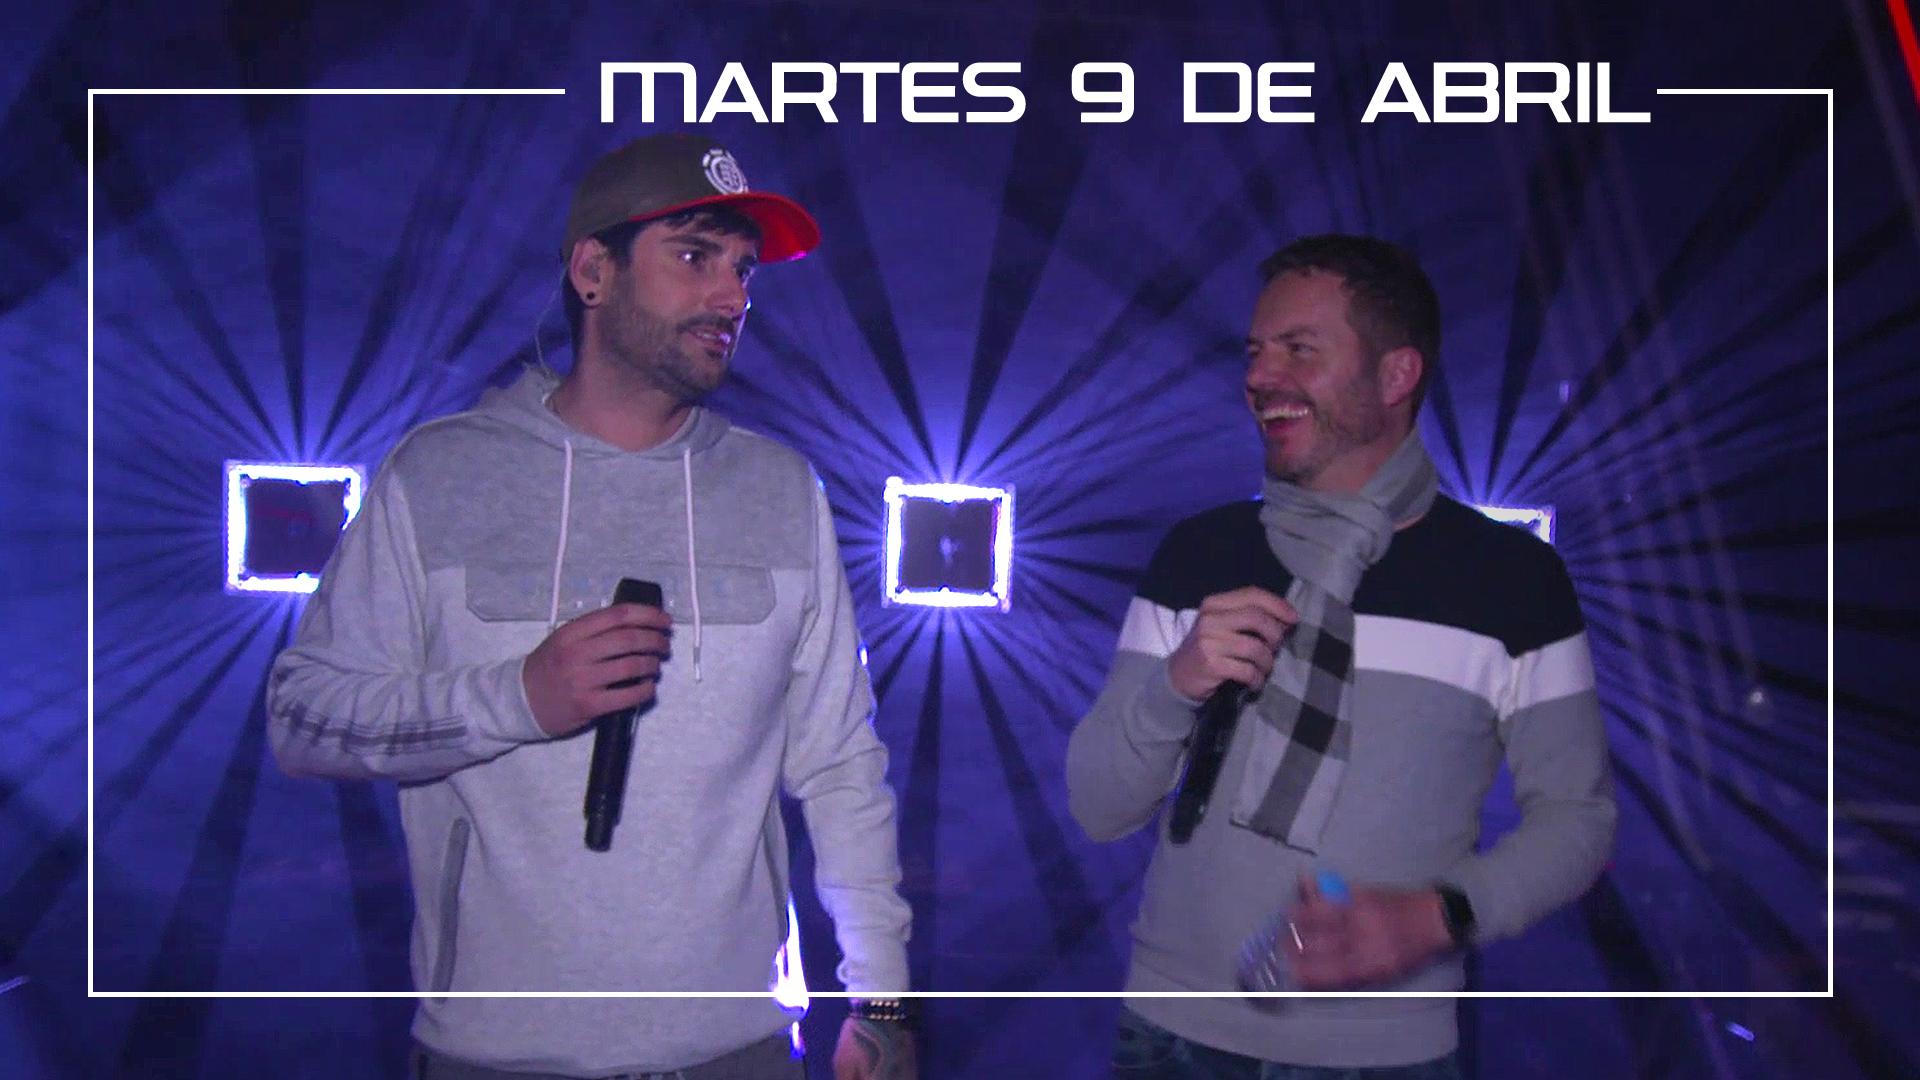 Martes 9 de abril Melendi y Ángel Cortés ensayan en plató el tema 'Besos a la lona'